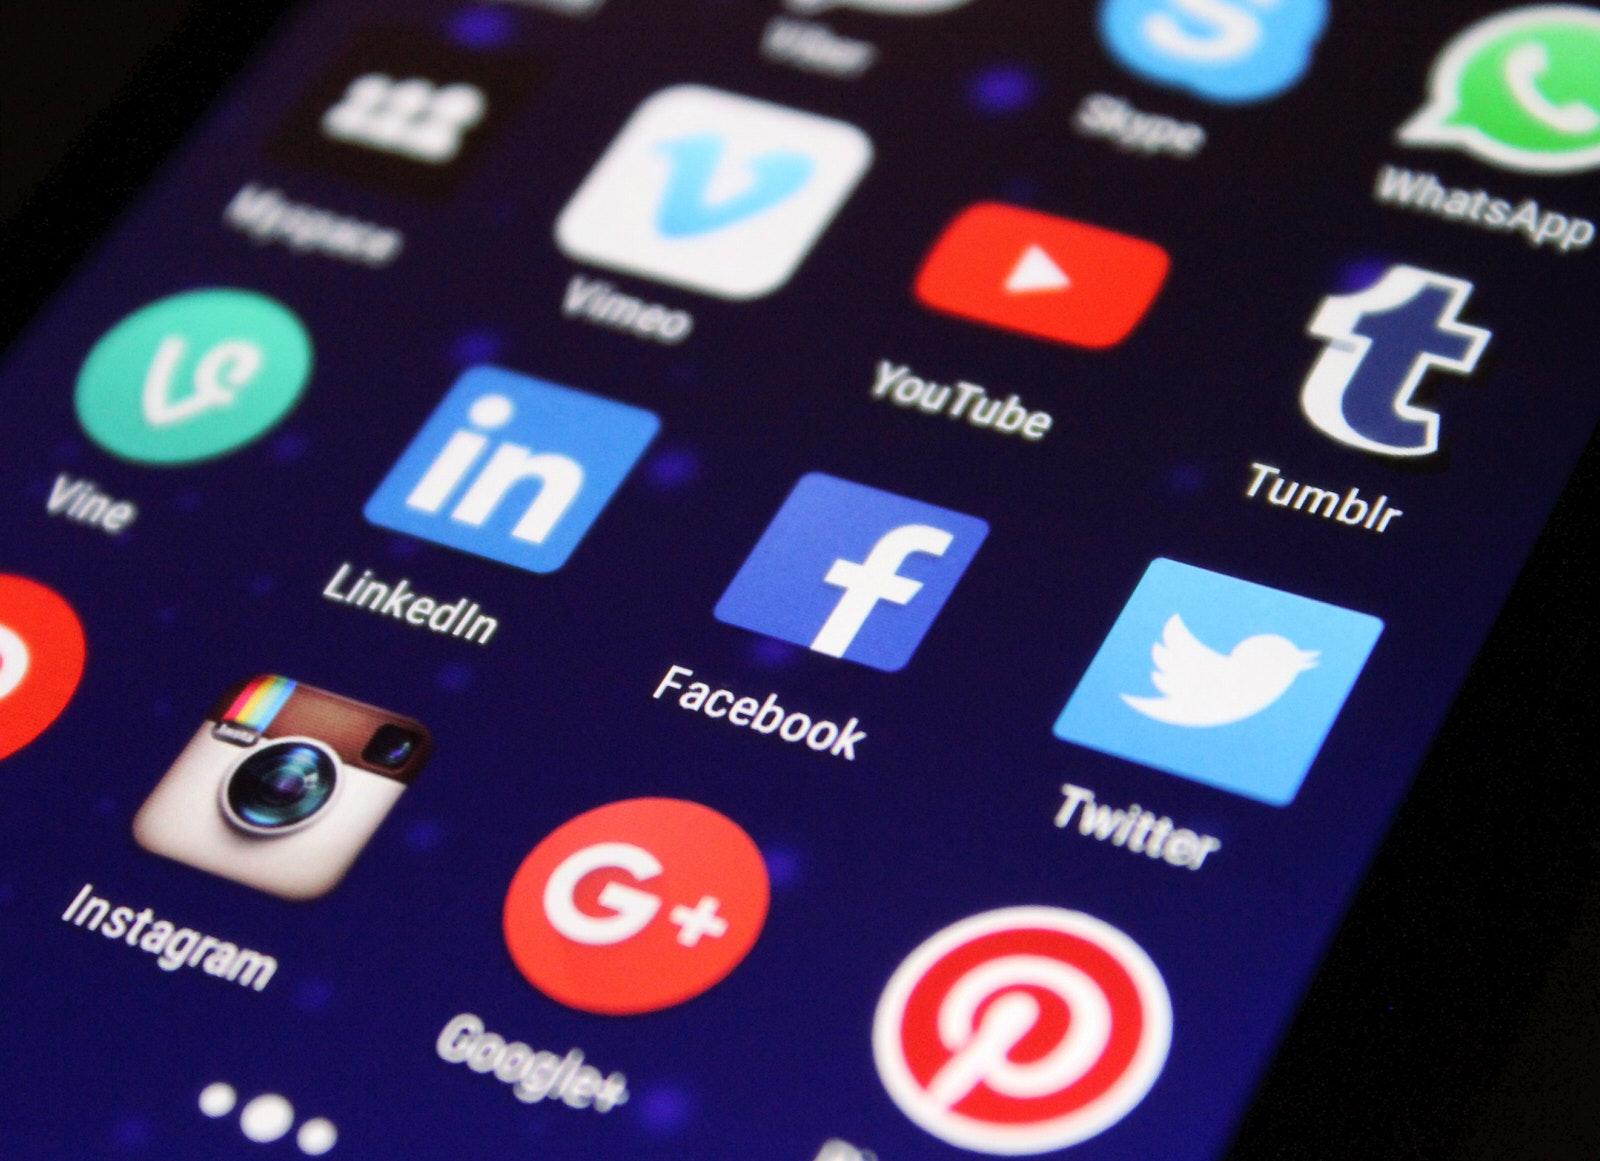 The_Web_2.0_History_Of_The_Internet_Social_Media_Icons_Facebook_Twitter_Vimeo_Youtube_Instagram_Linkedin_Google_Pinterest_Whatsapp